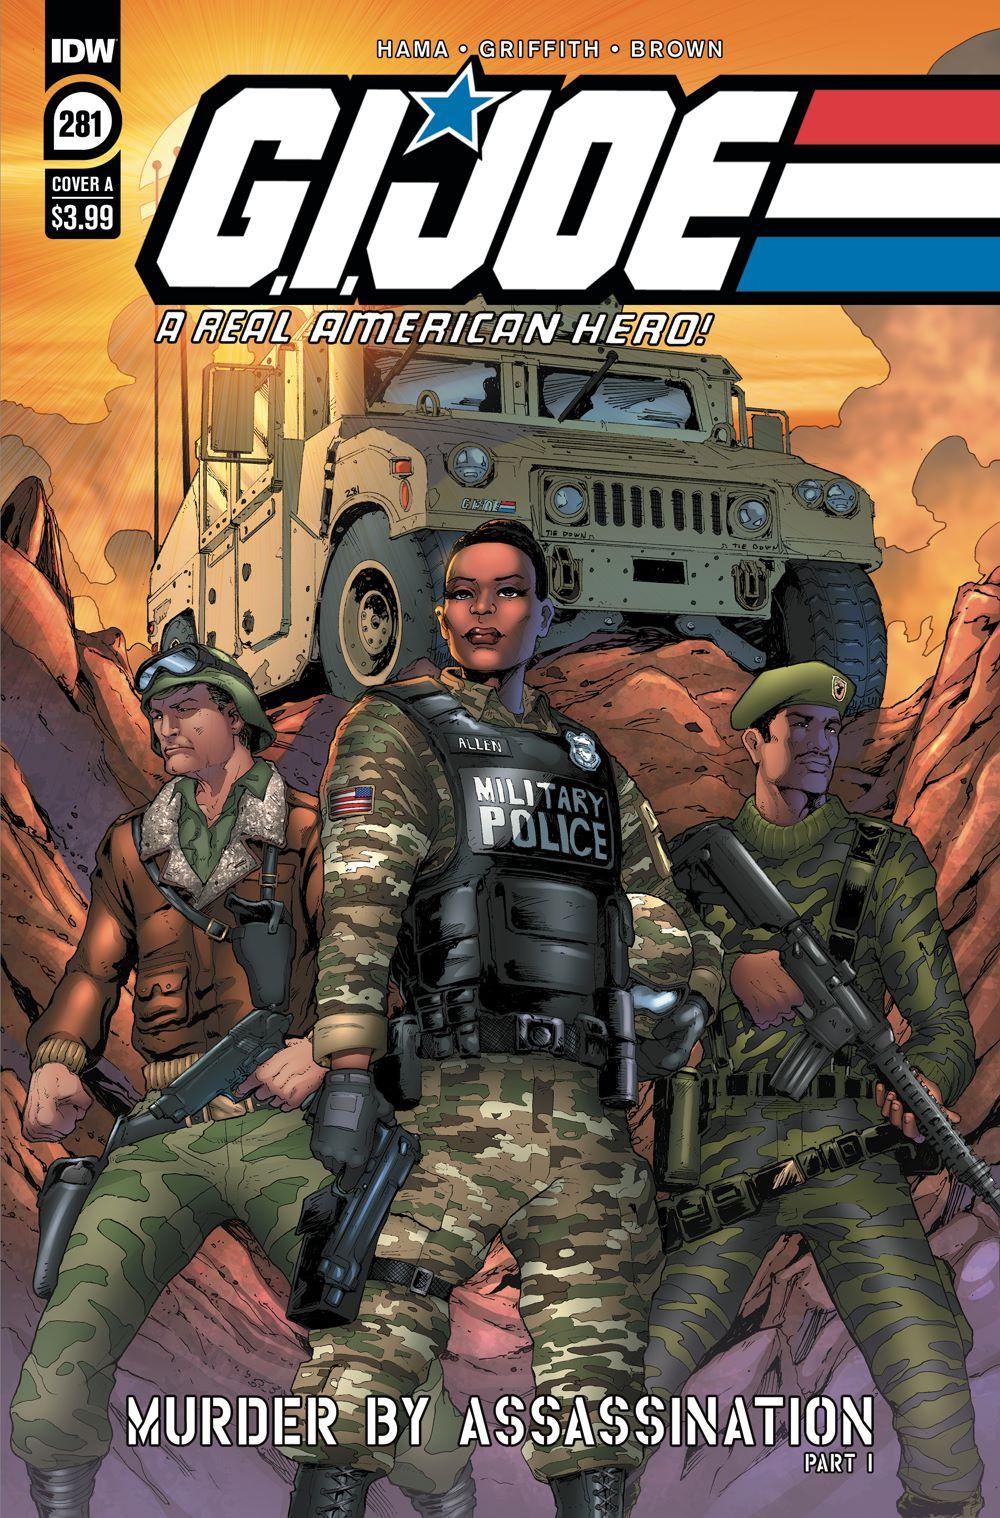 GIJoeRAH281-coverA ComicList Previews: G.I. JOE A REAL AMERICAN HERO #281